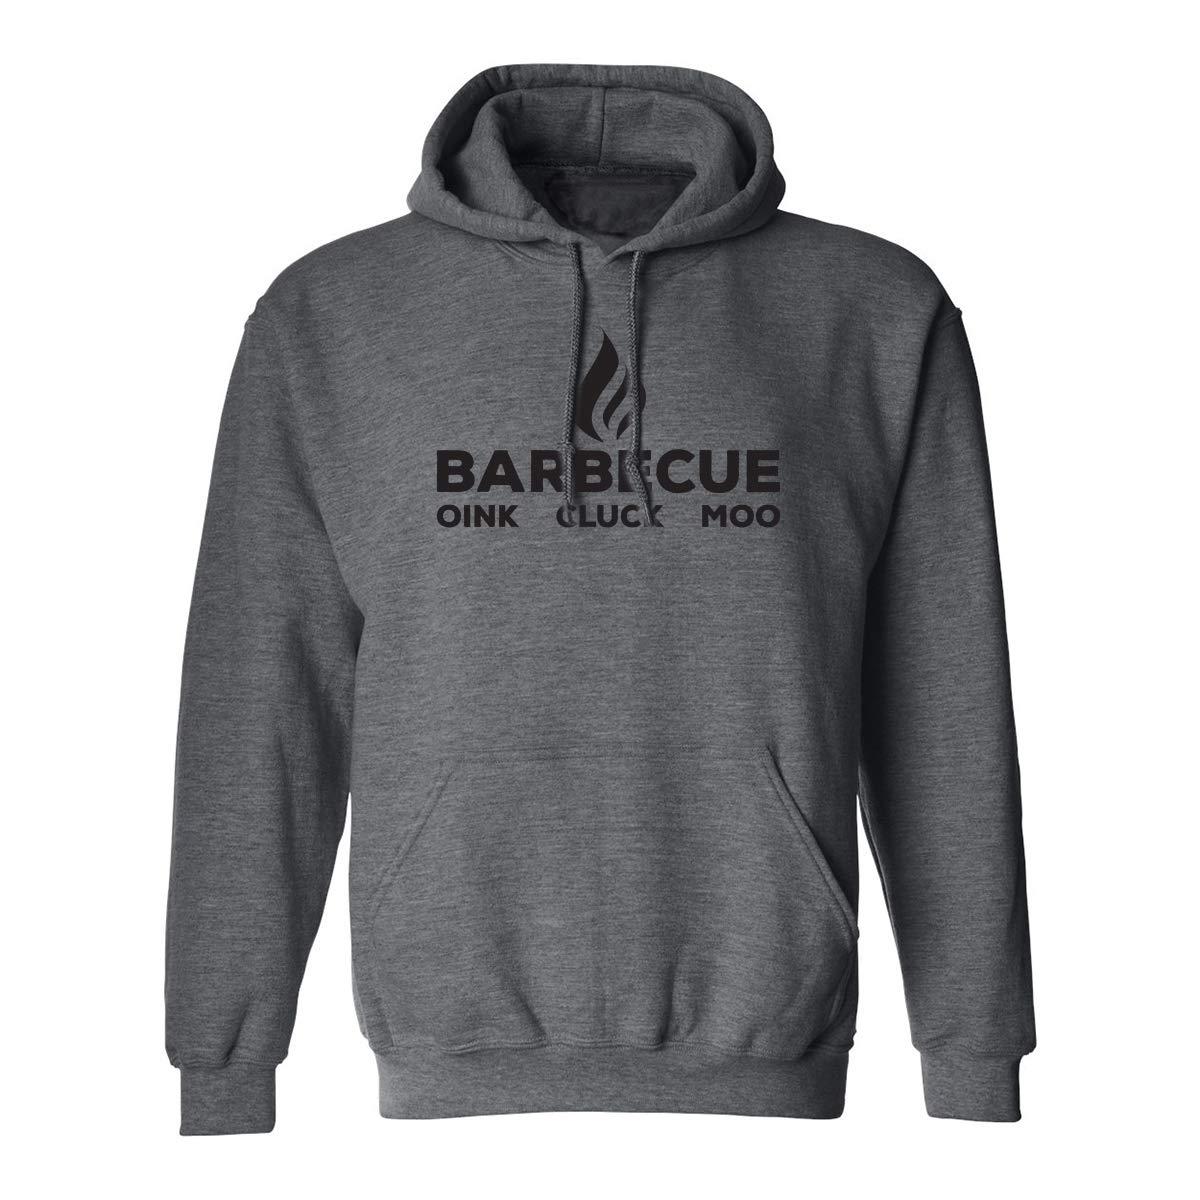 zerogravitee Barbecue oink Cluck moo Adult Hooded Sweatshirt